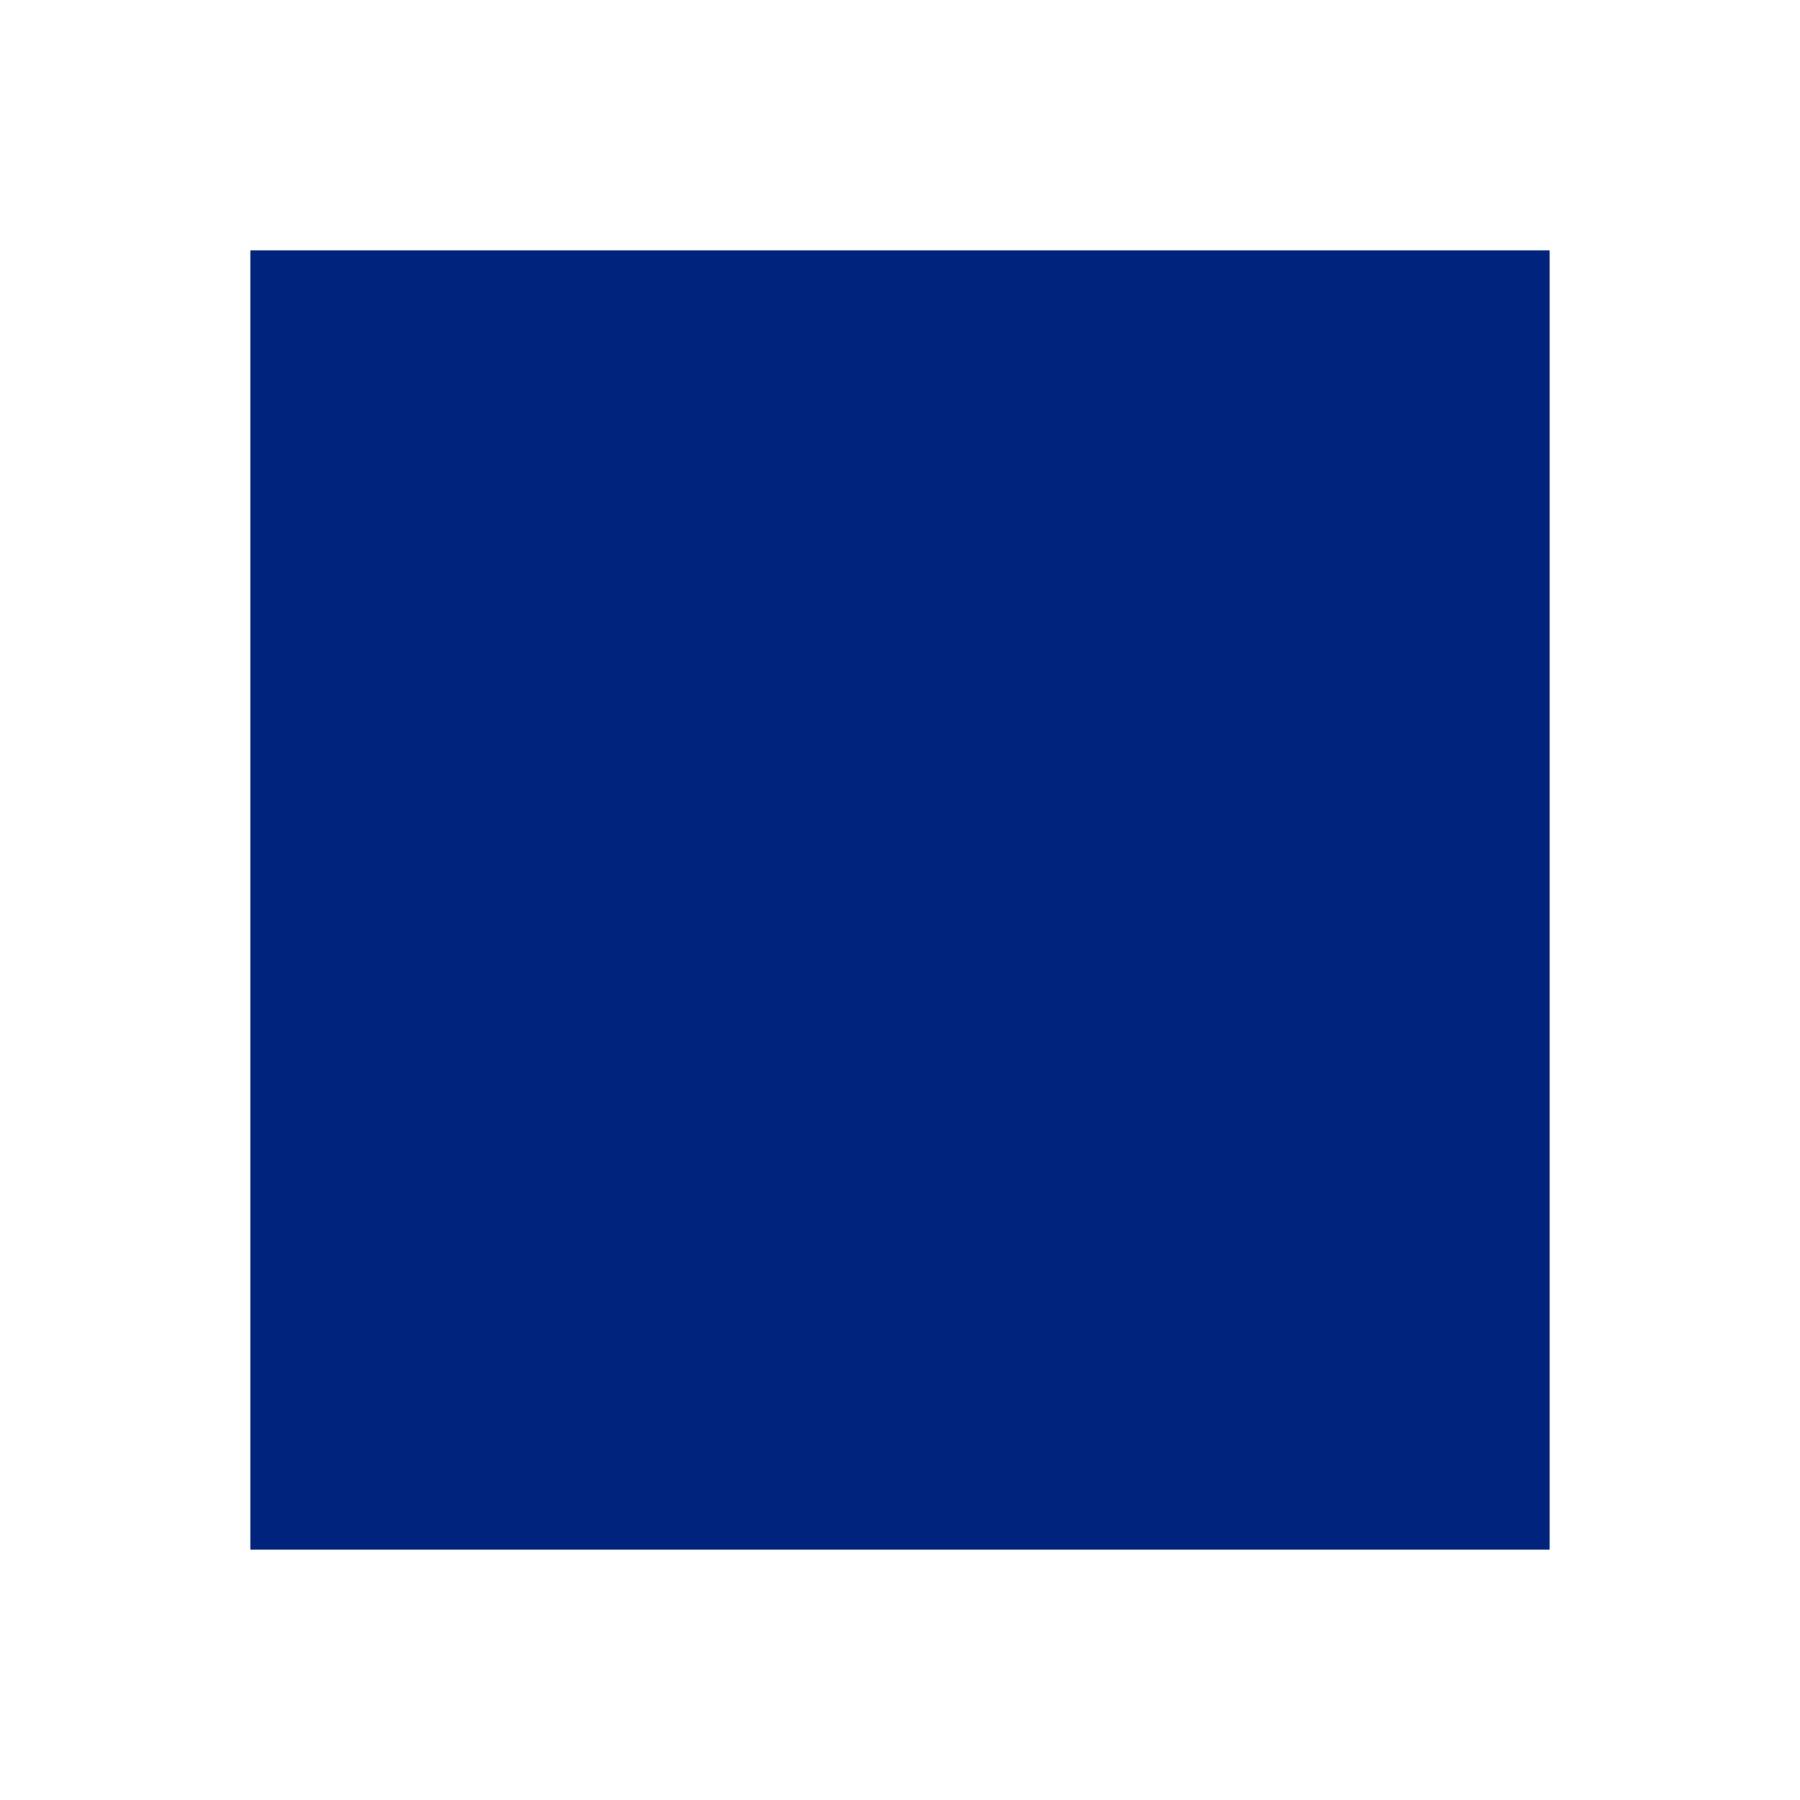 Vinilo termotranferible Brick® 600, hoja 30x50 cm Azul real